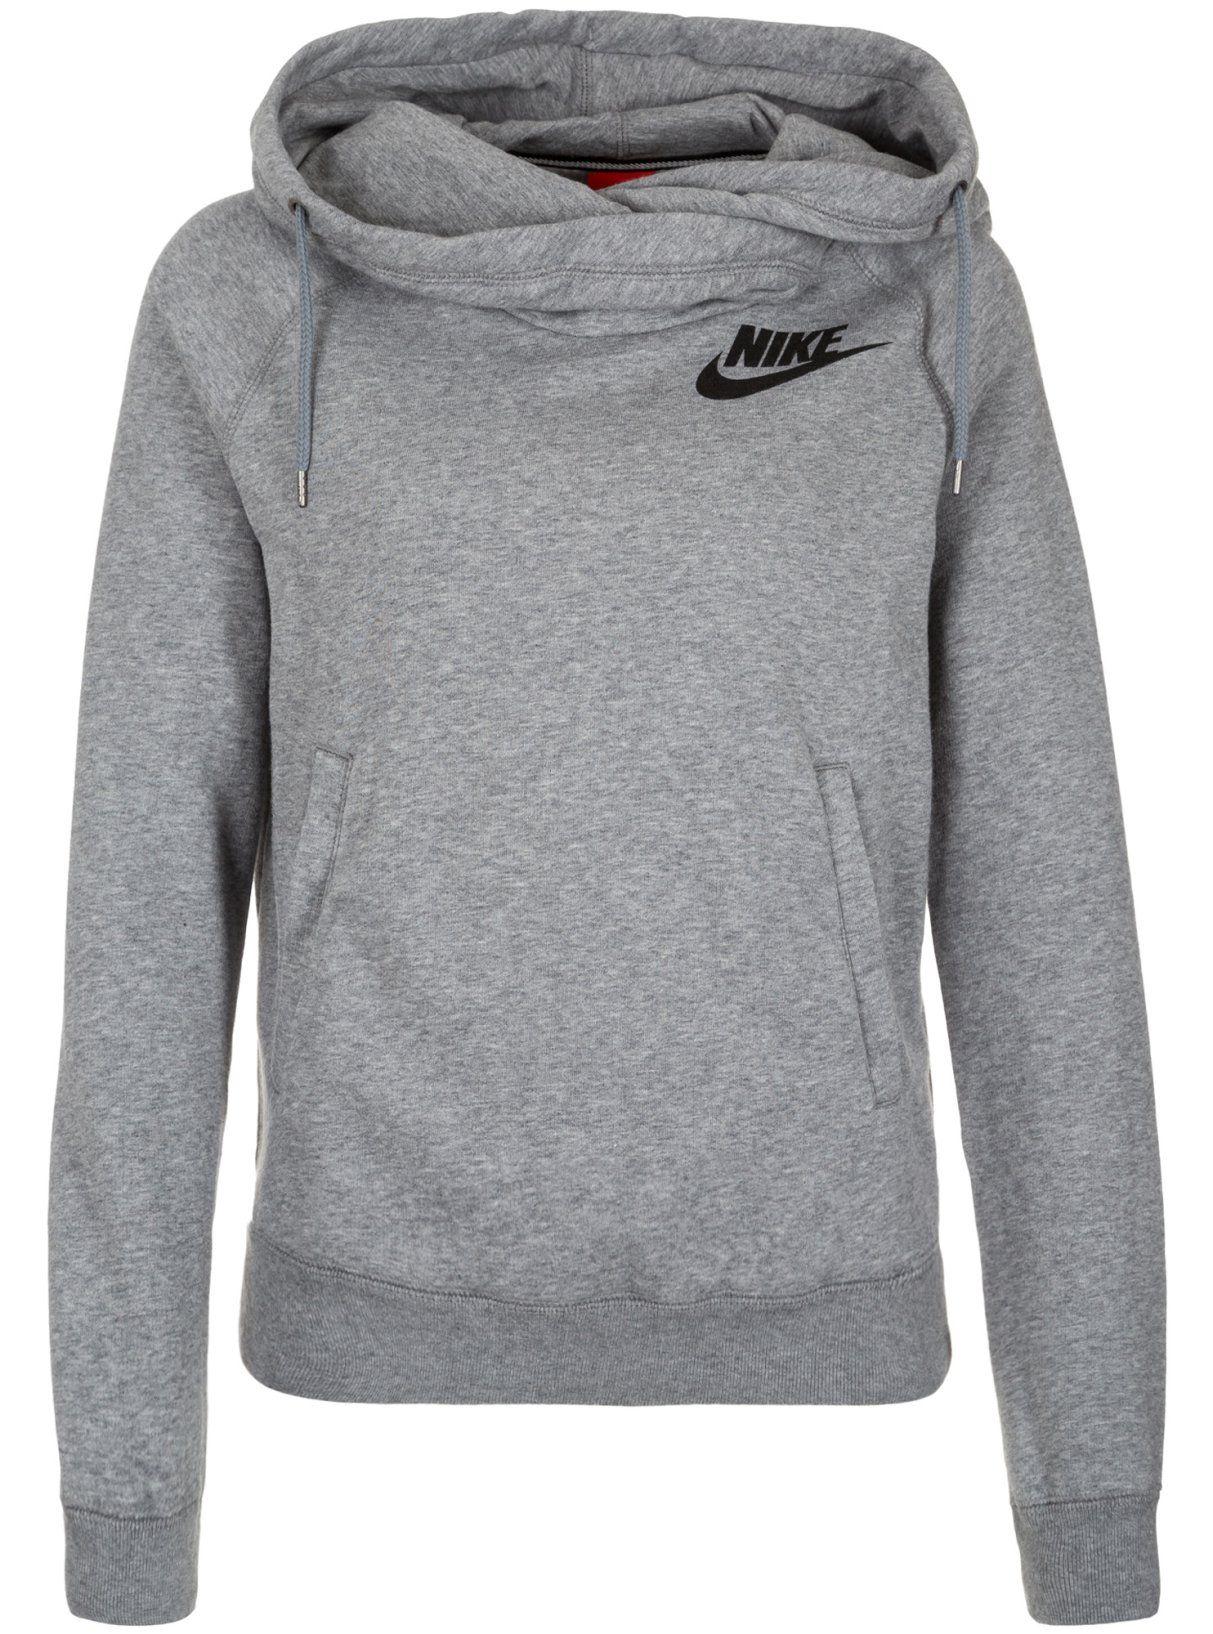 Hoodie Nike Sweatshirts For Girls fd7b6a6d4